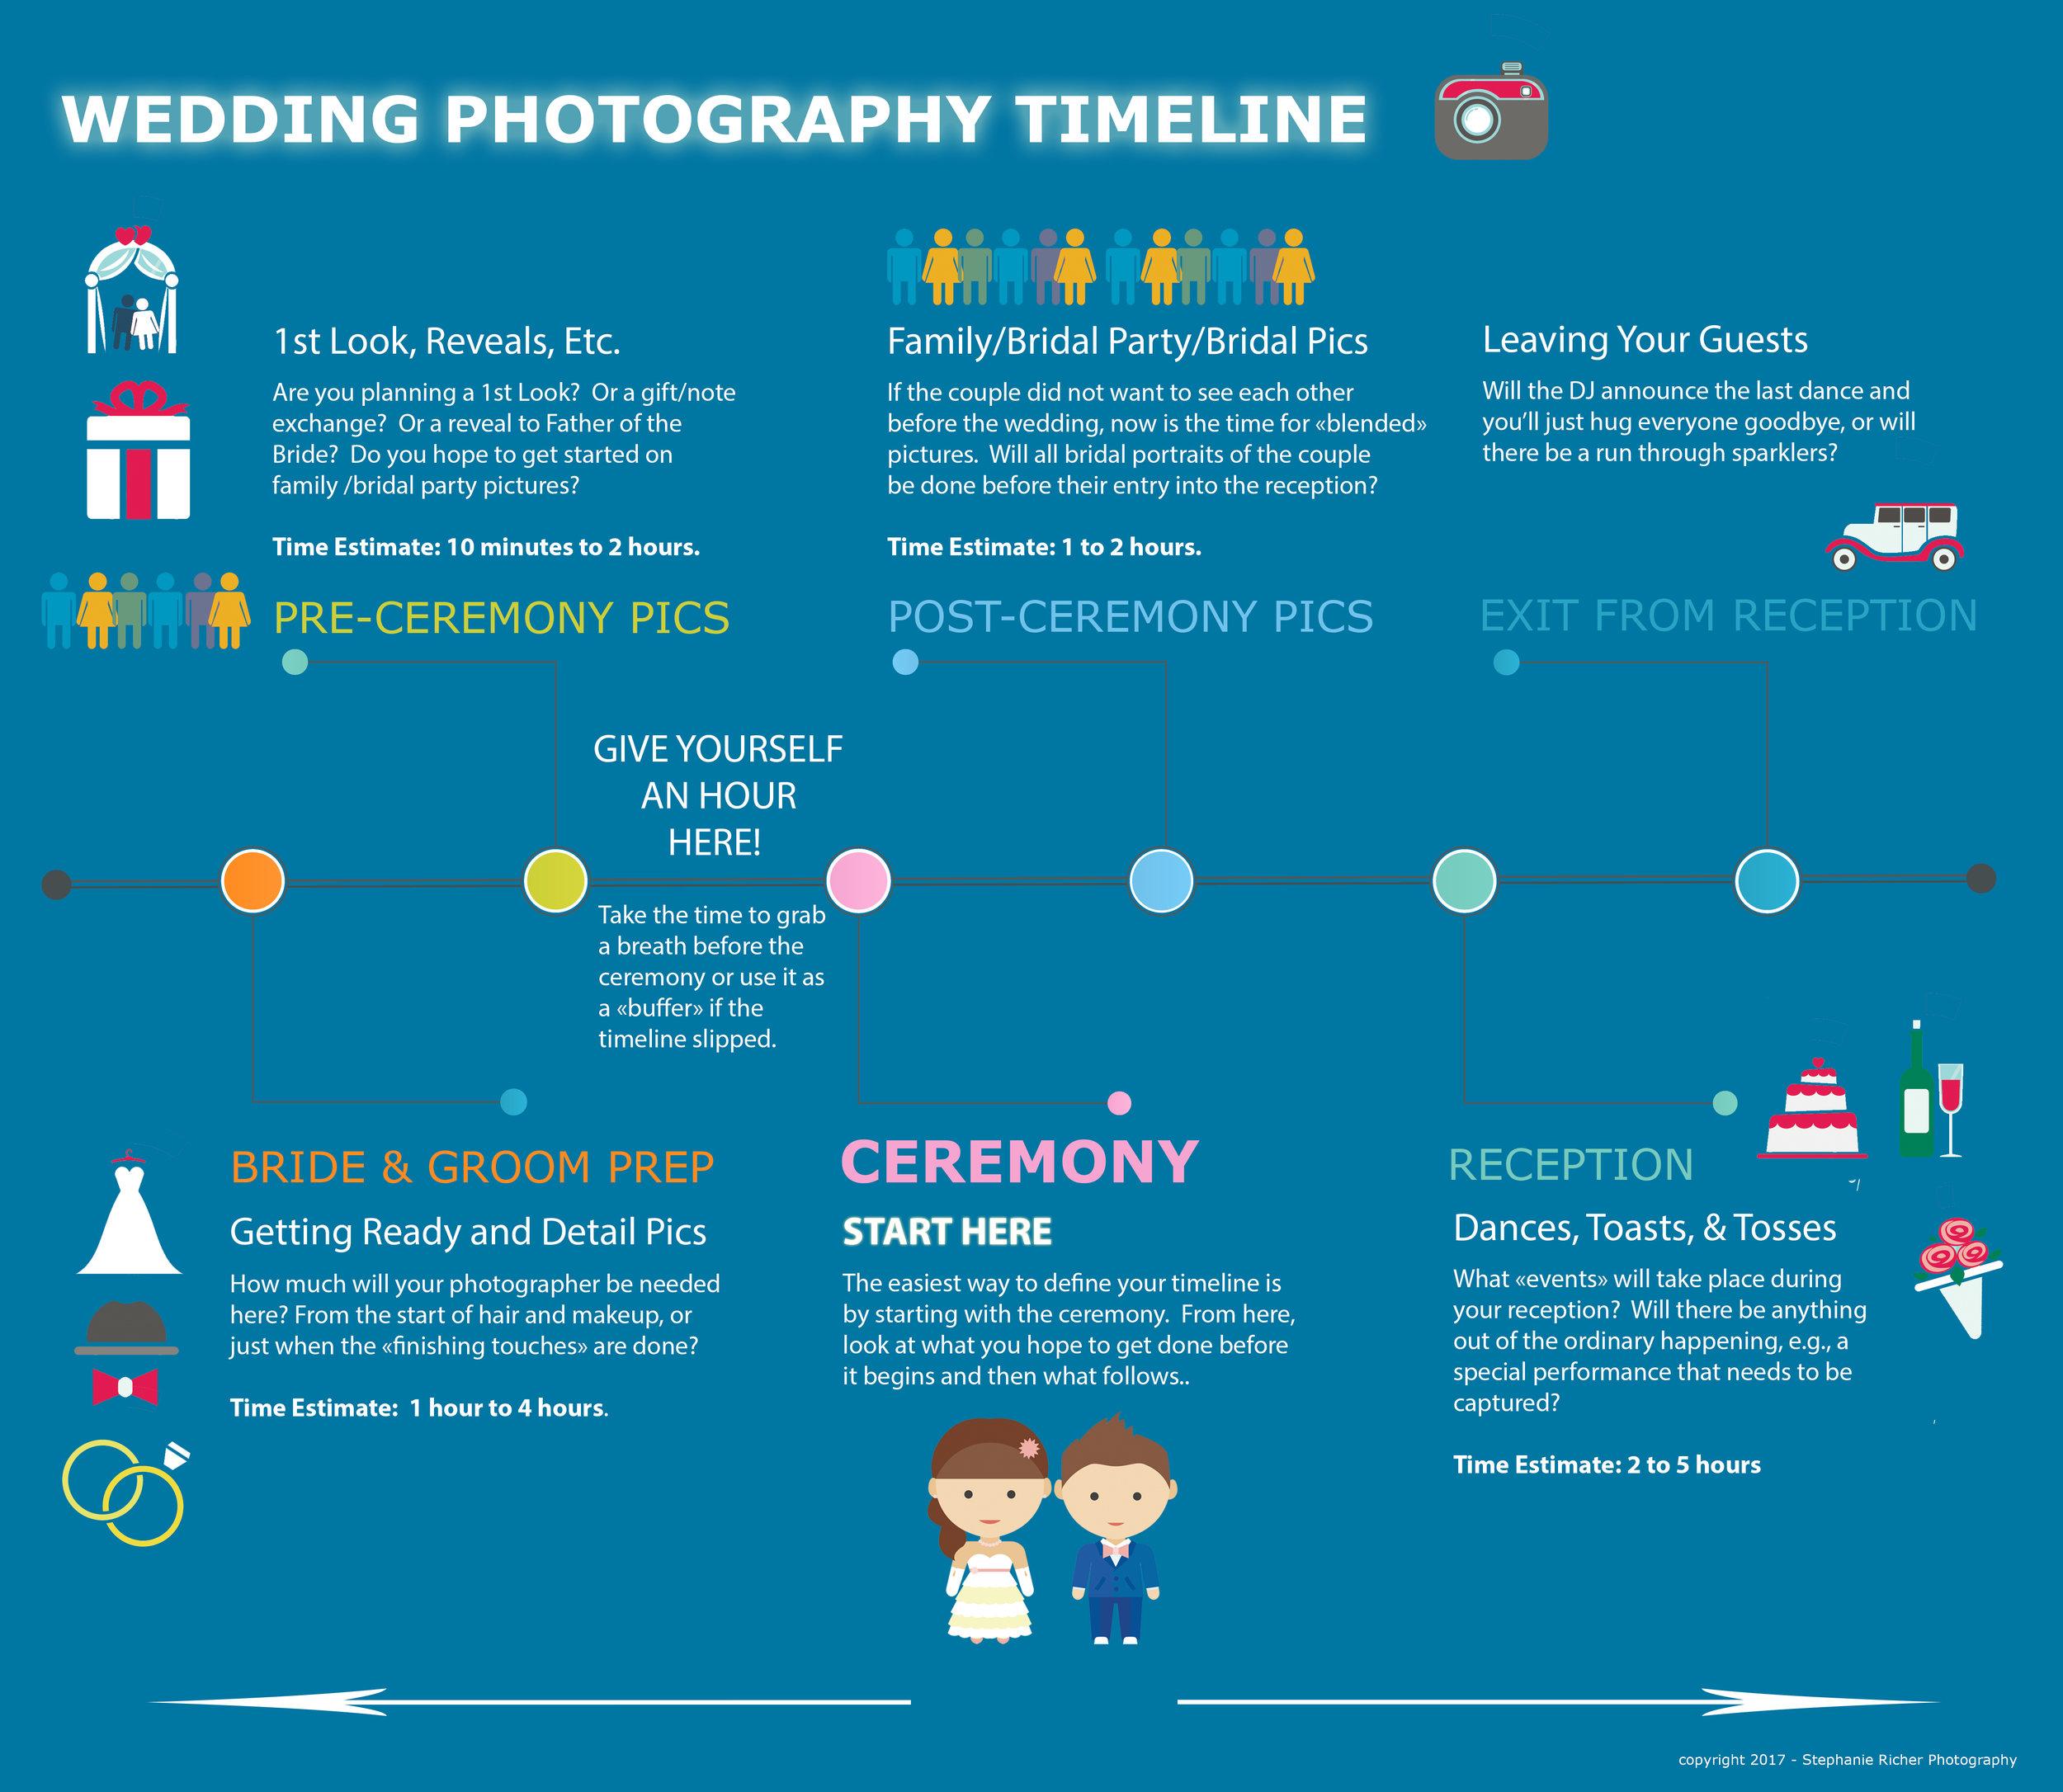 Timeline Infographic.jpg